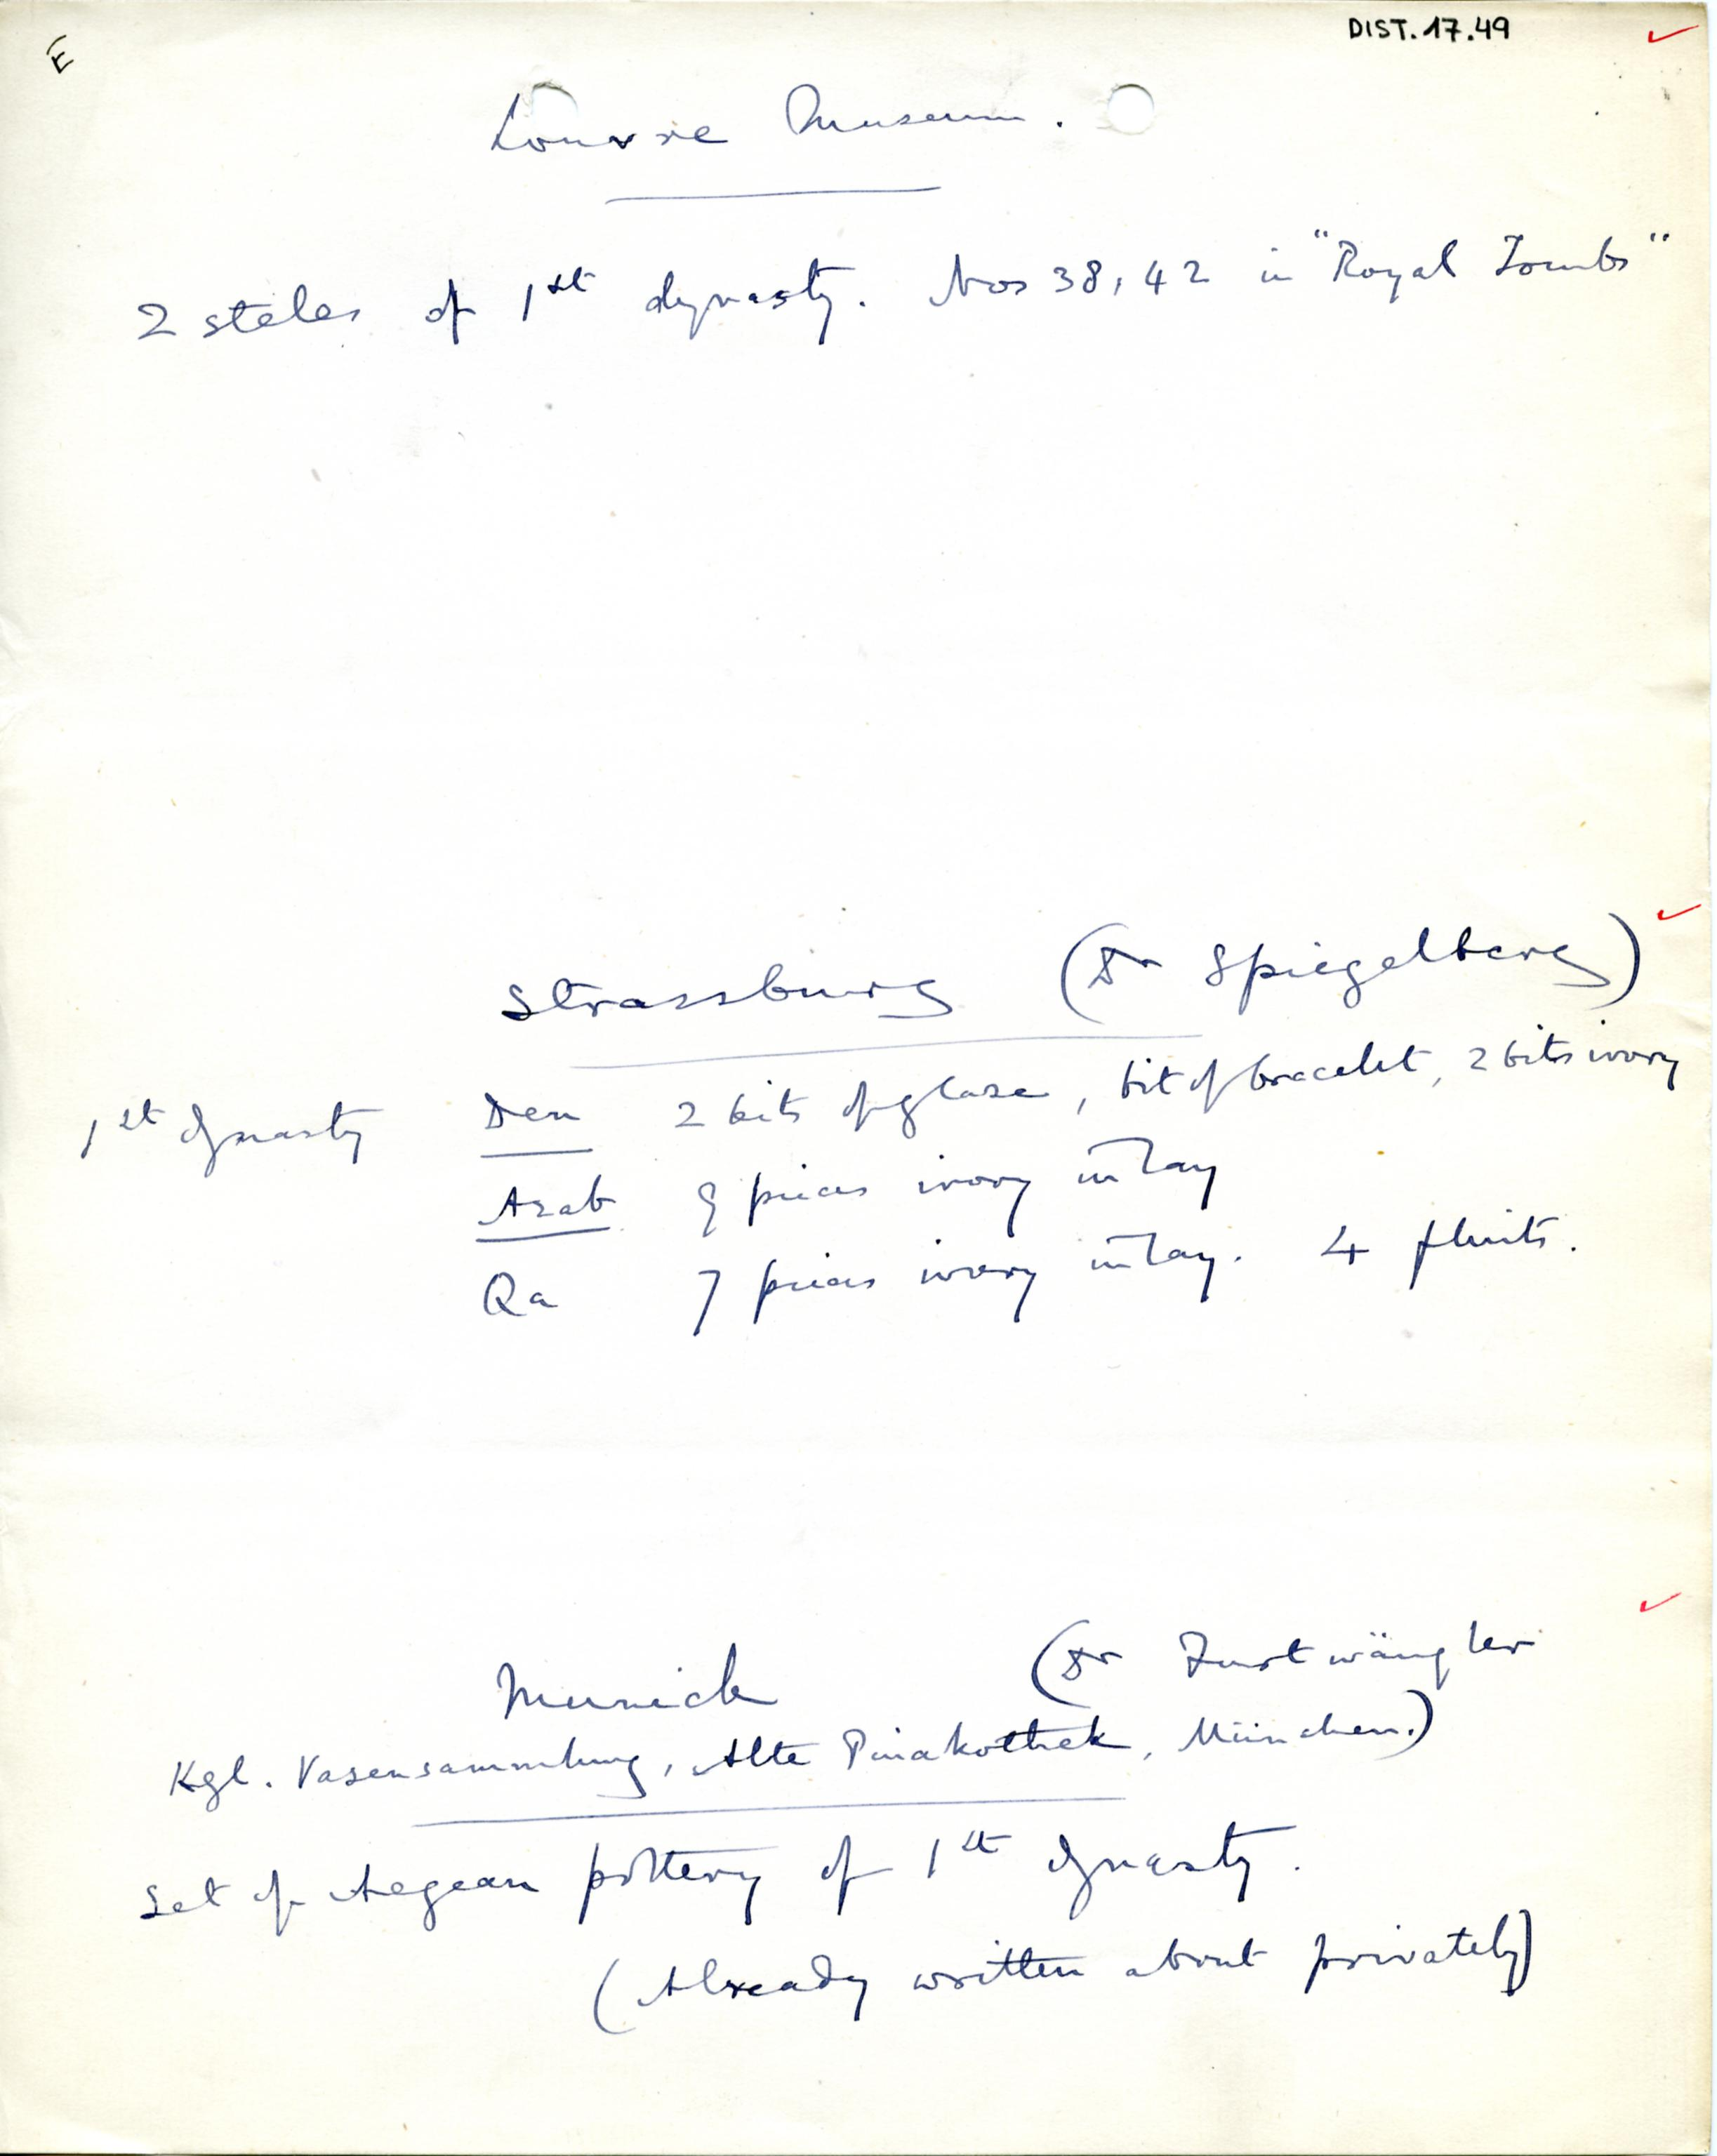 1898-1899 Hu, 1899-1900 Abydos DIST.17.49